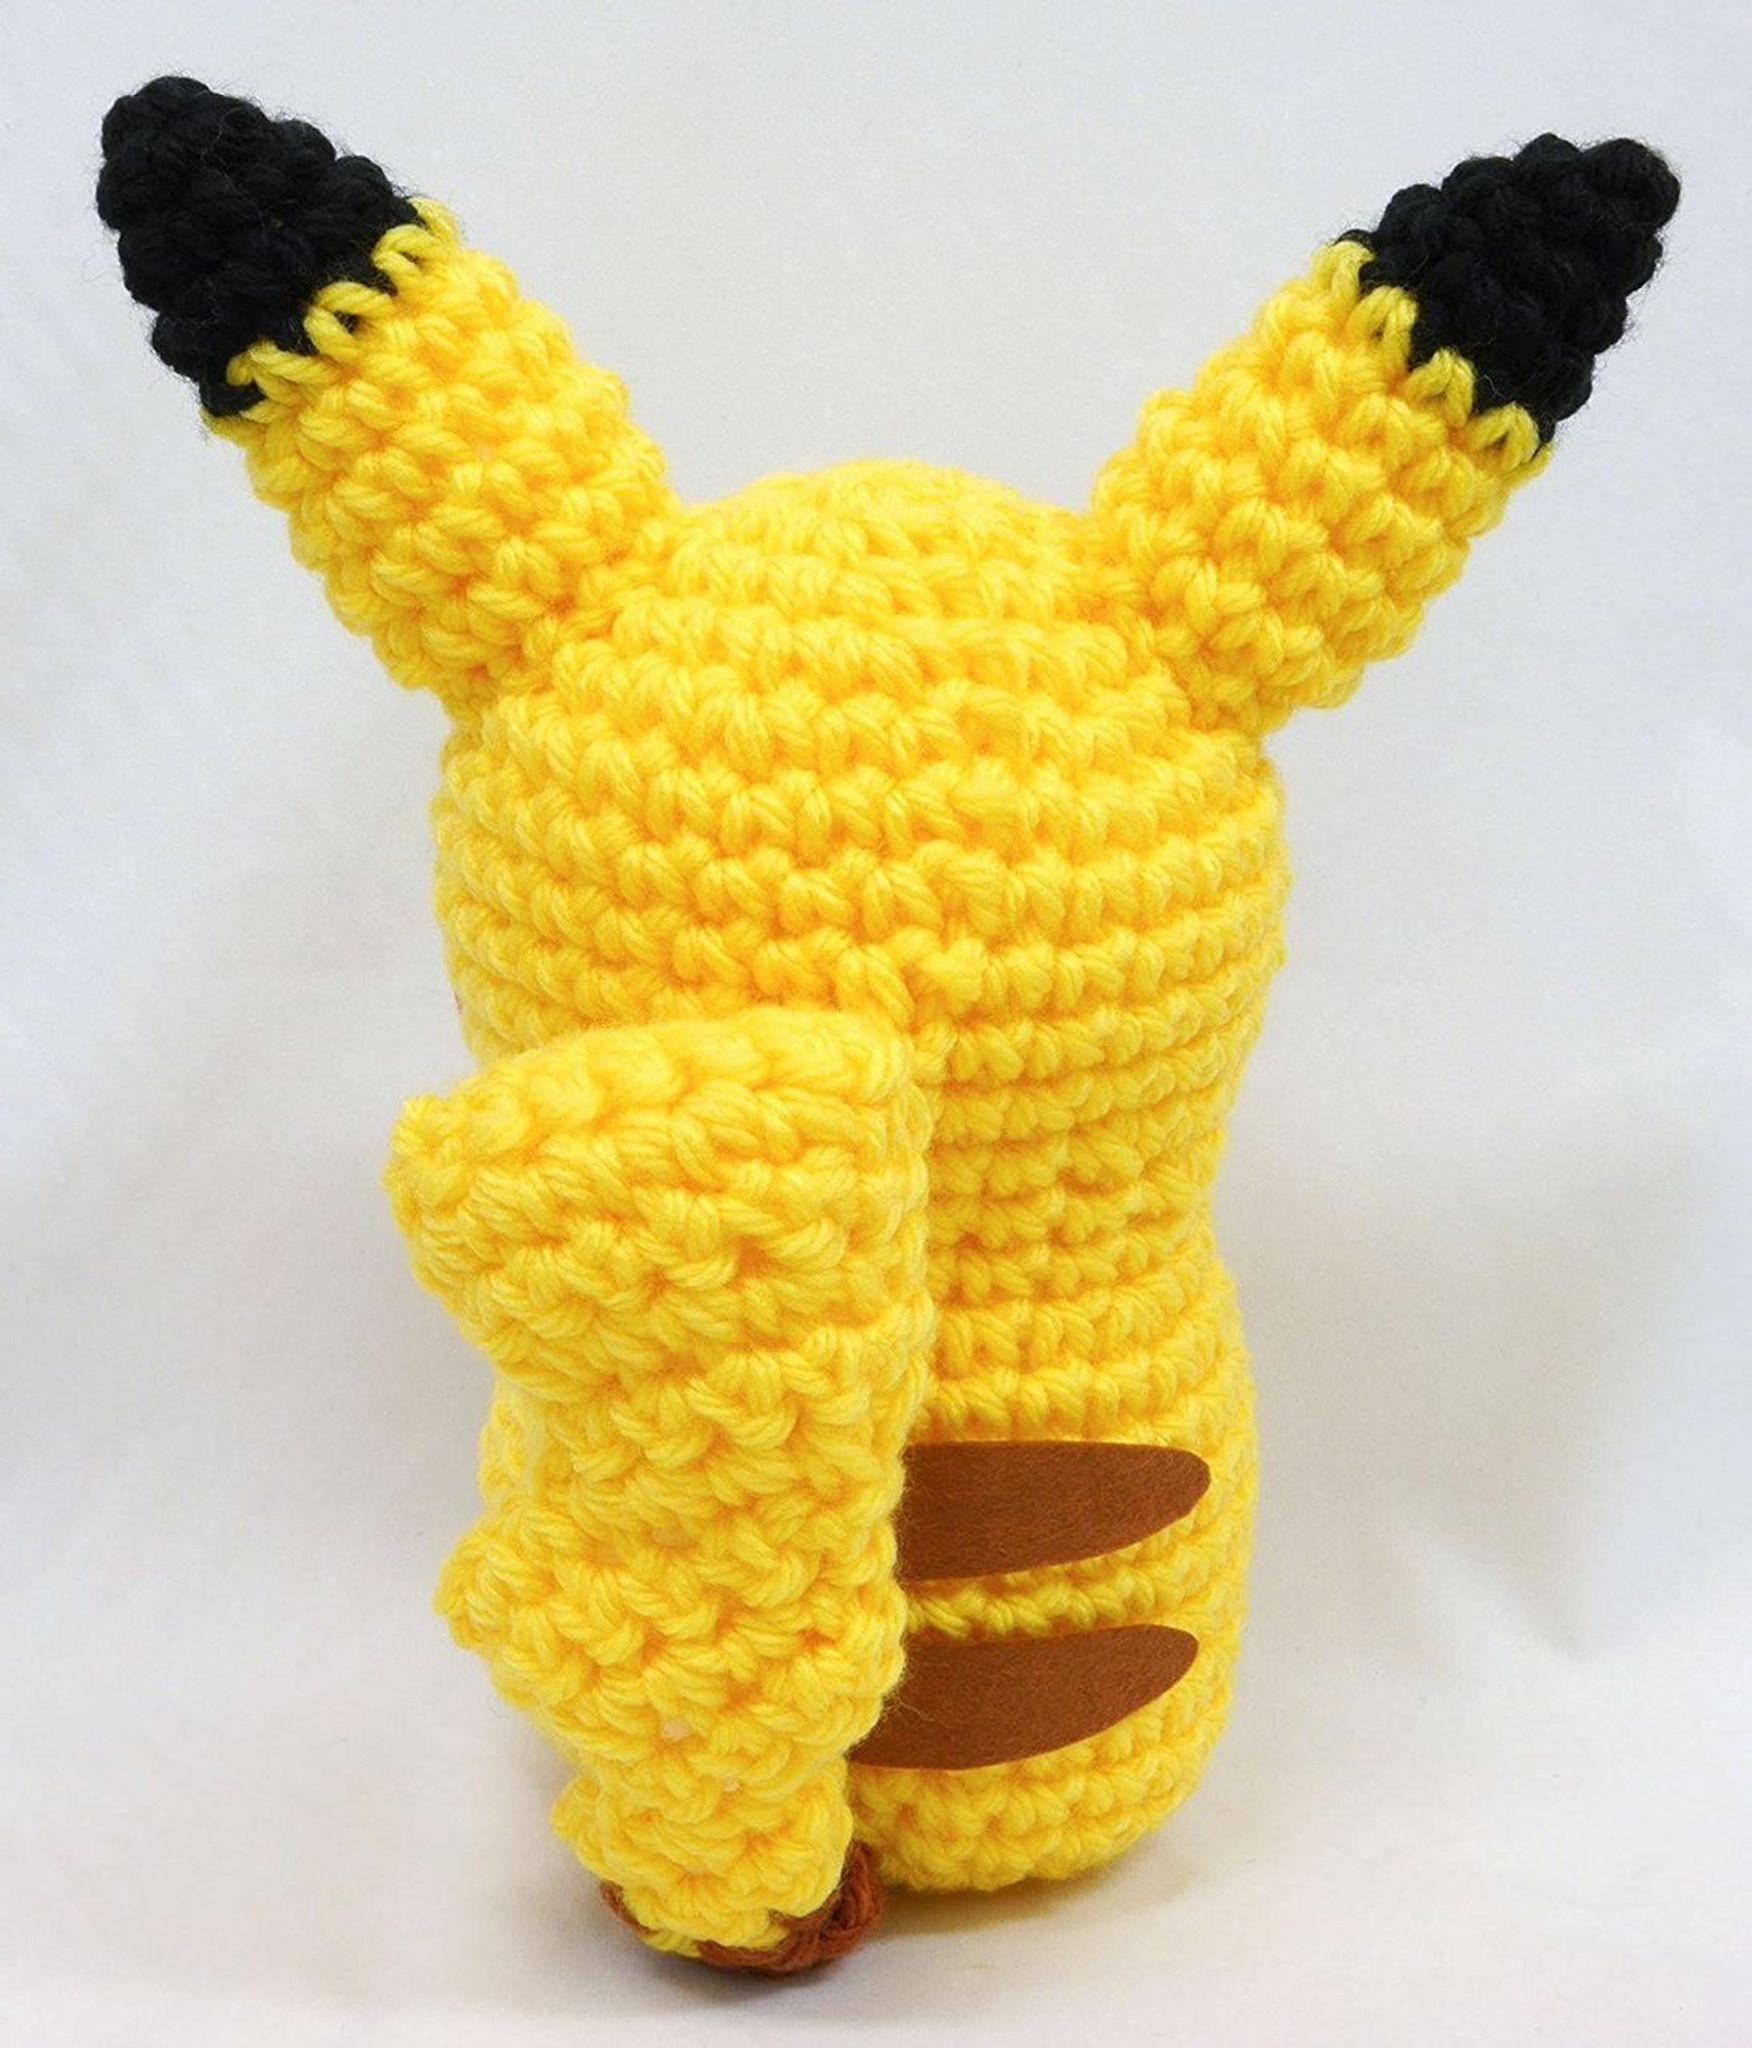 Hamanaka H306-168 Pokemon Pikachu Big Amigurumi (Crochet Doll) Kit